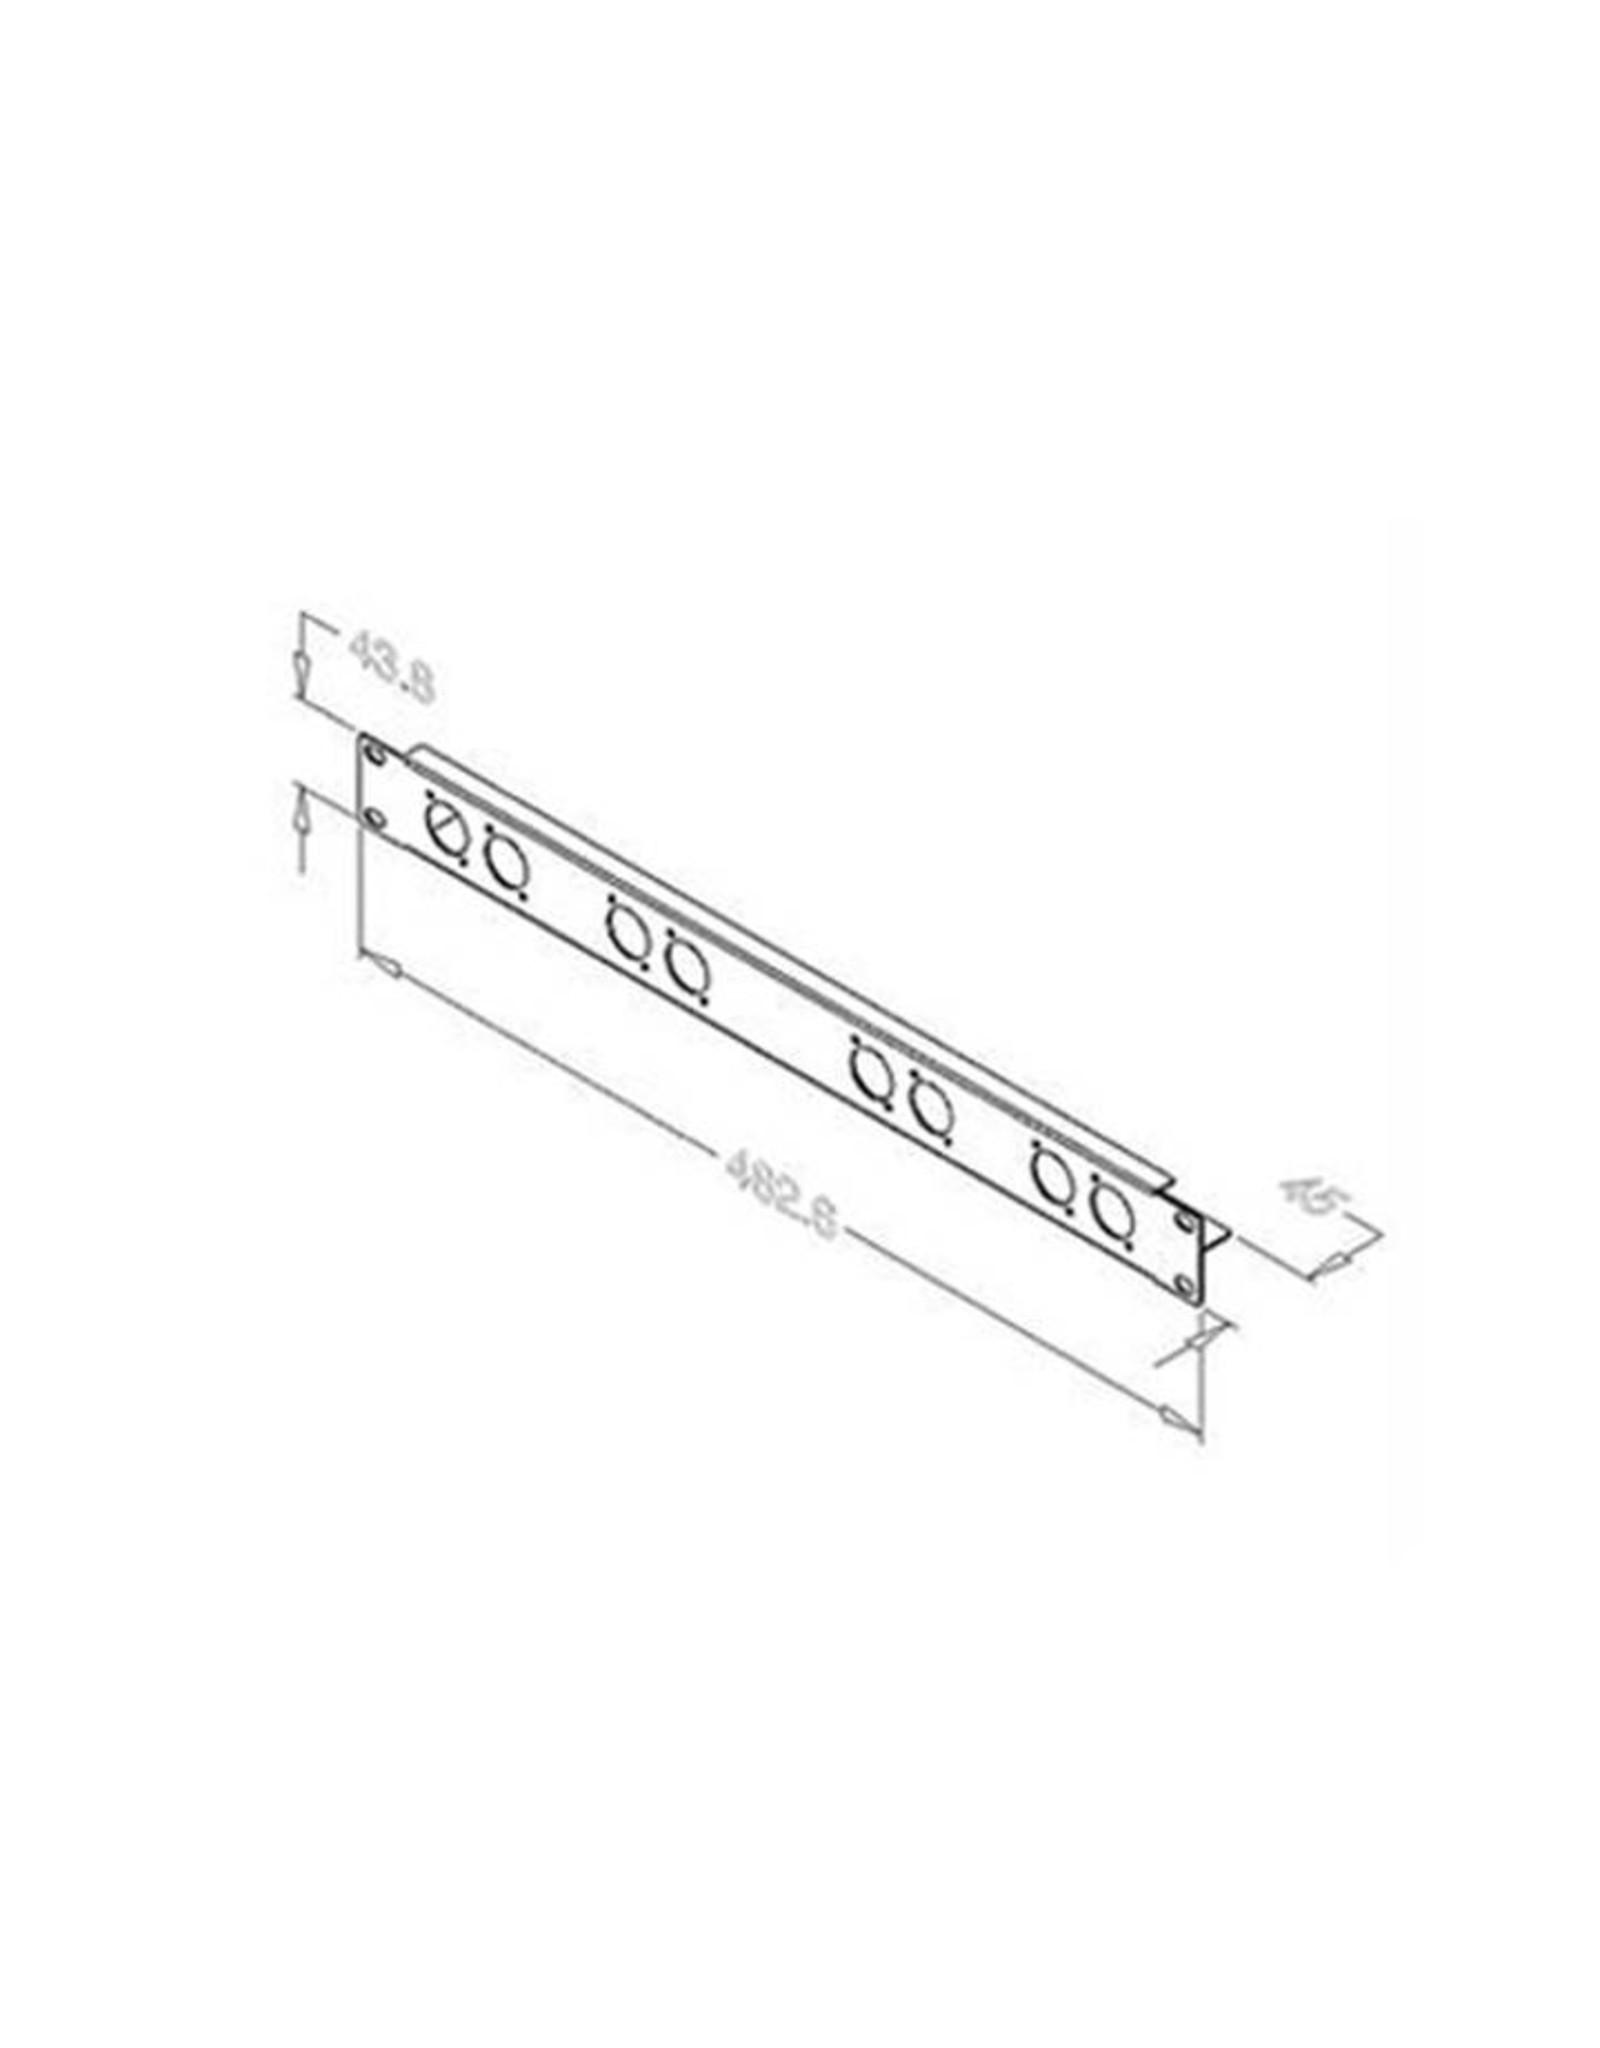 Penn Elcom Penn Elcom frontplaat, 8 gaten Neutrik D, 1 HE, staal + kabelbevestiging